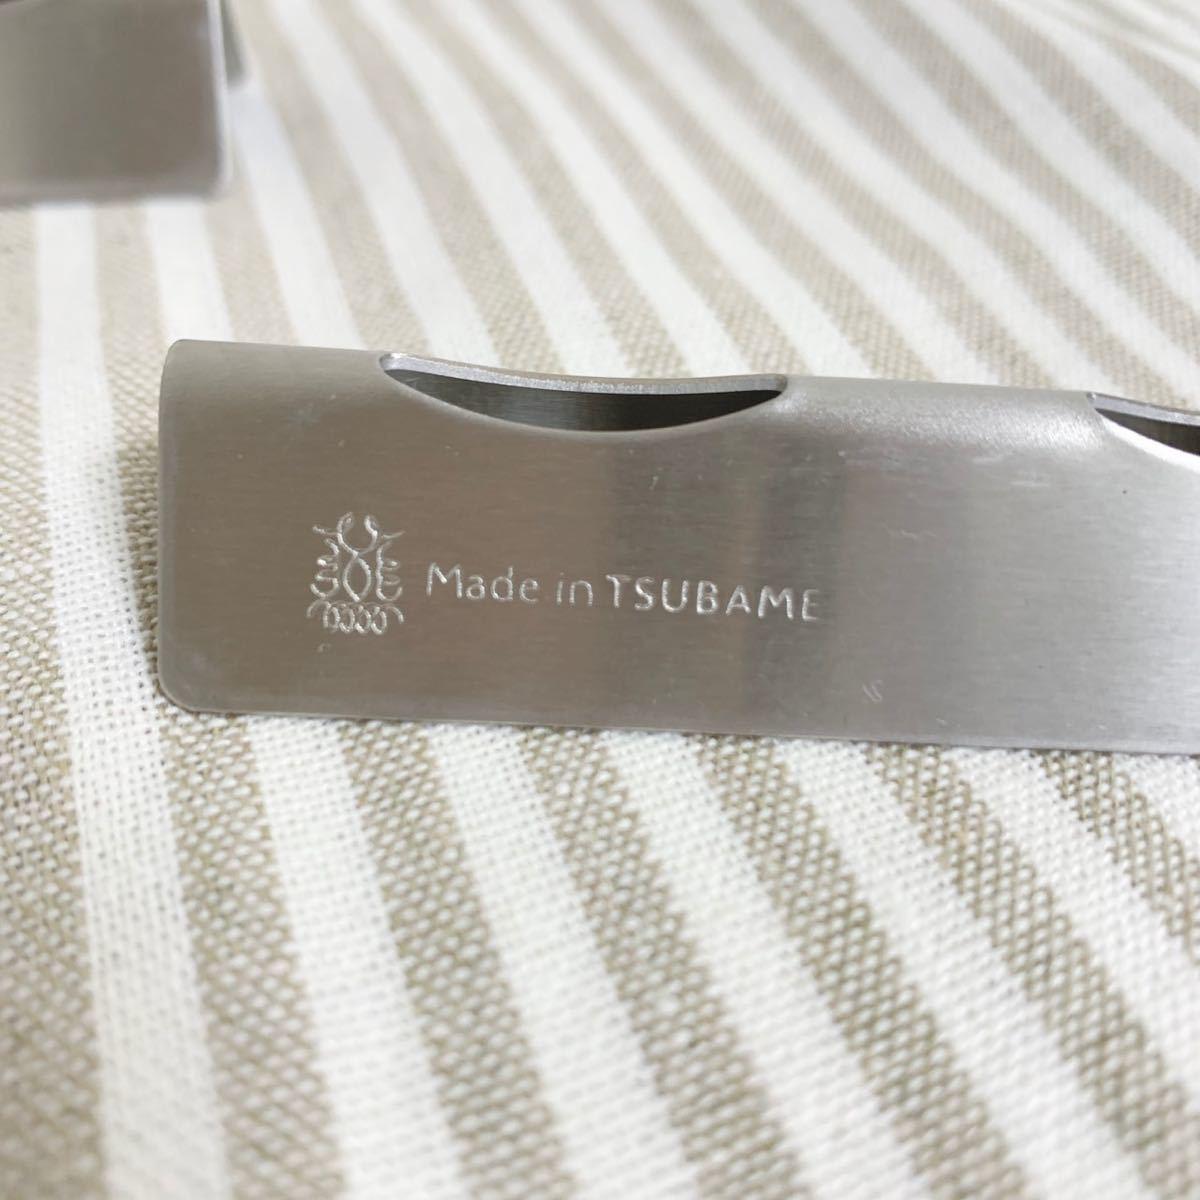 TSUBAME カトラリーレスト 4点 / 箸置 スプーン フォーク【送料無料】